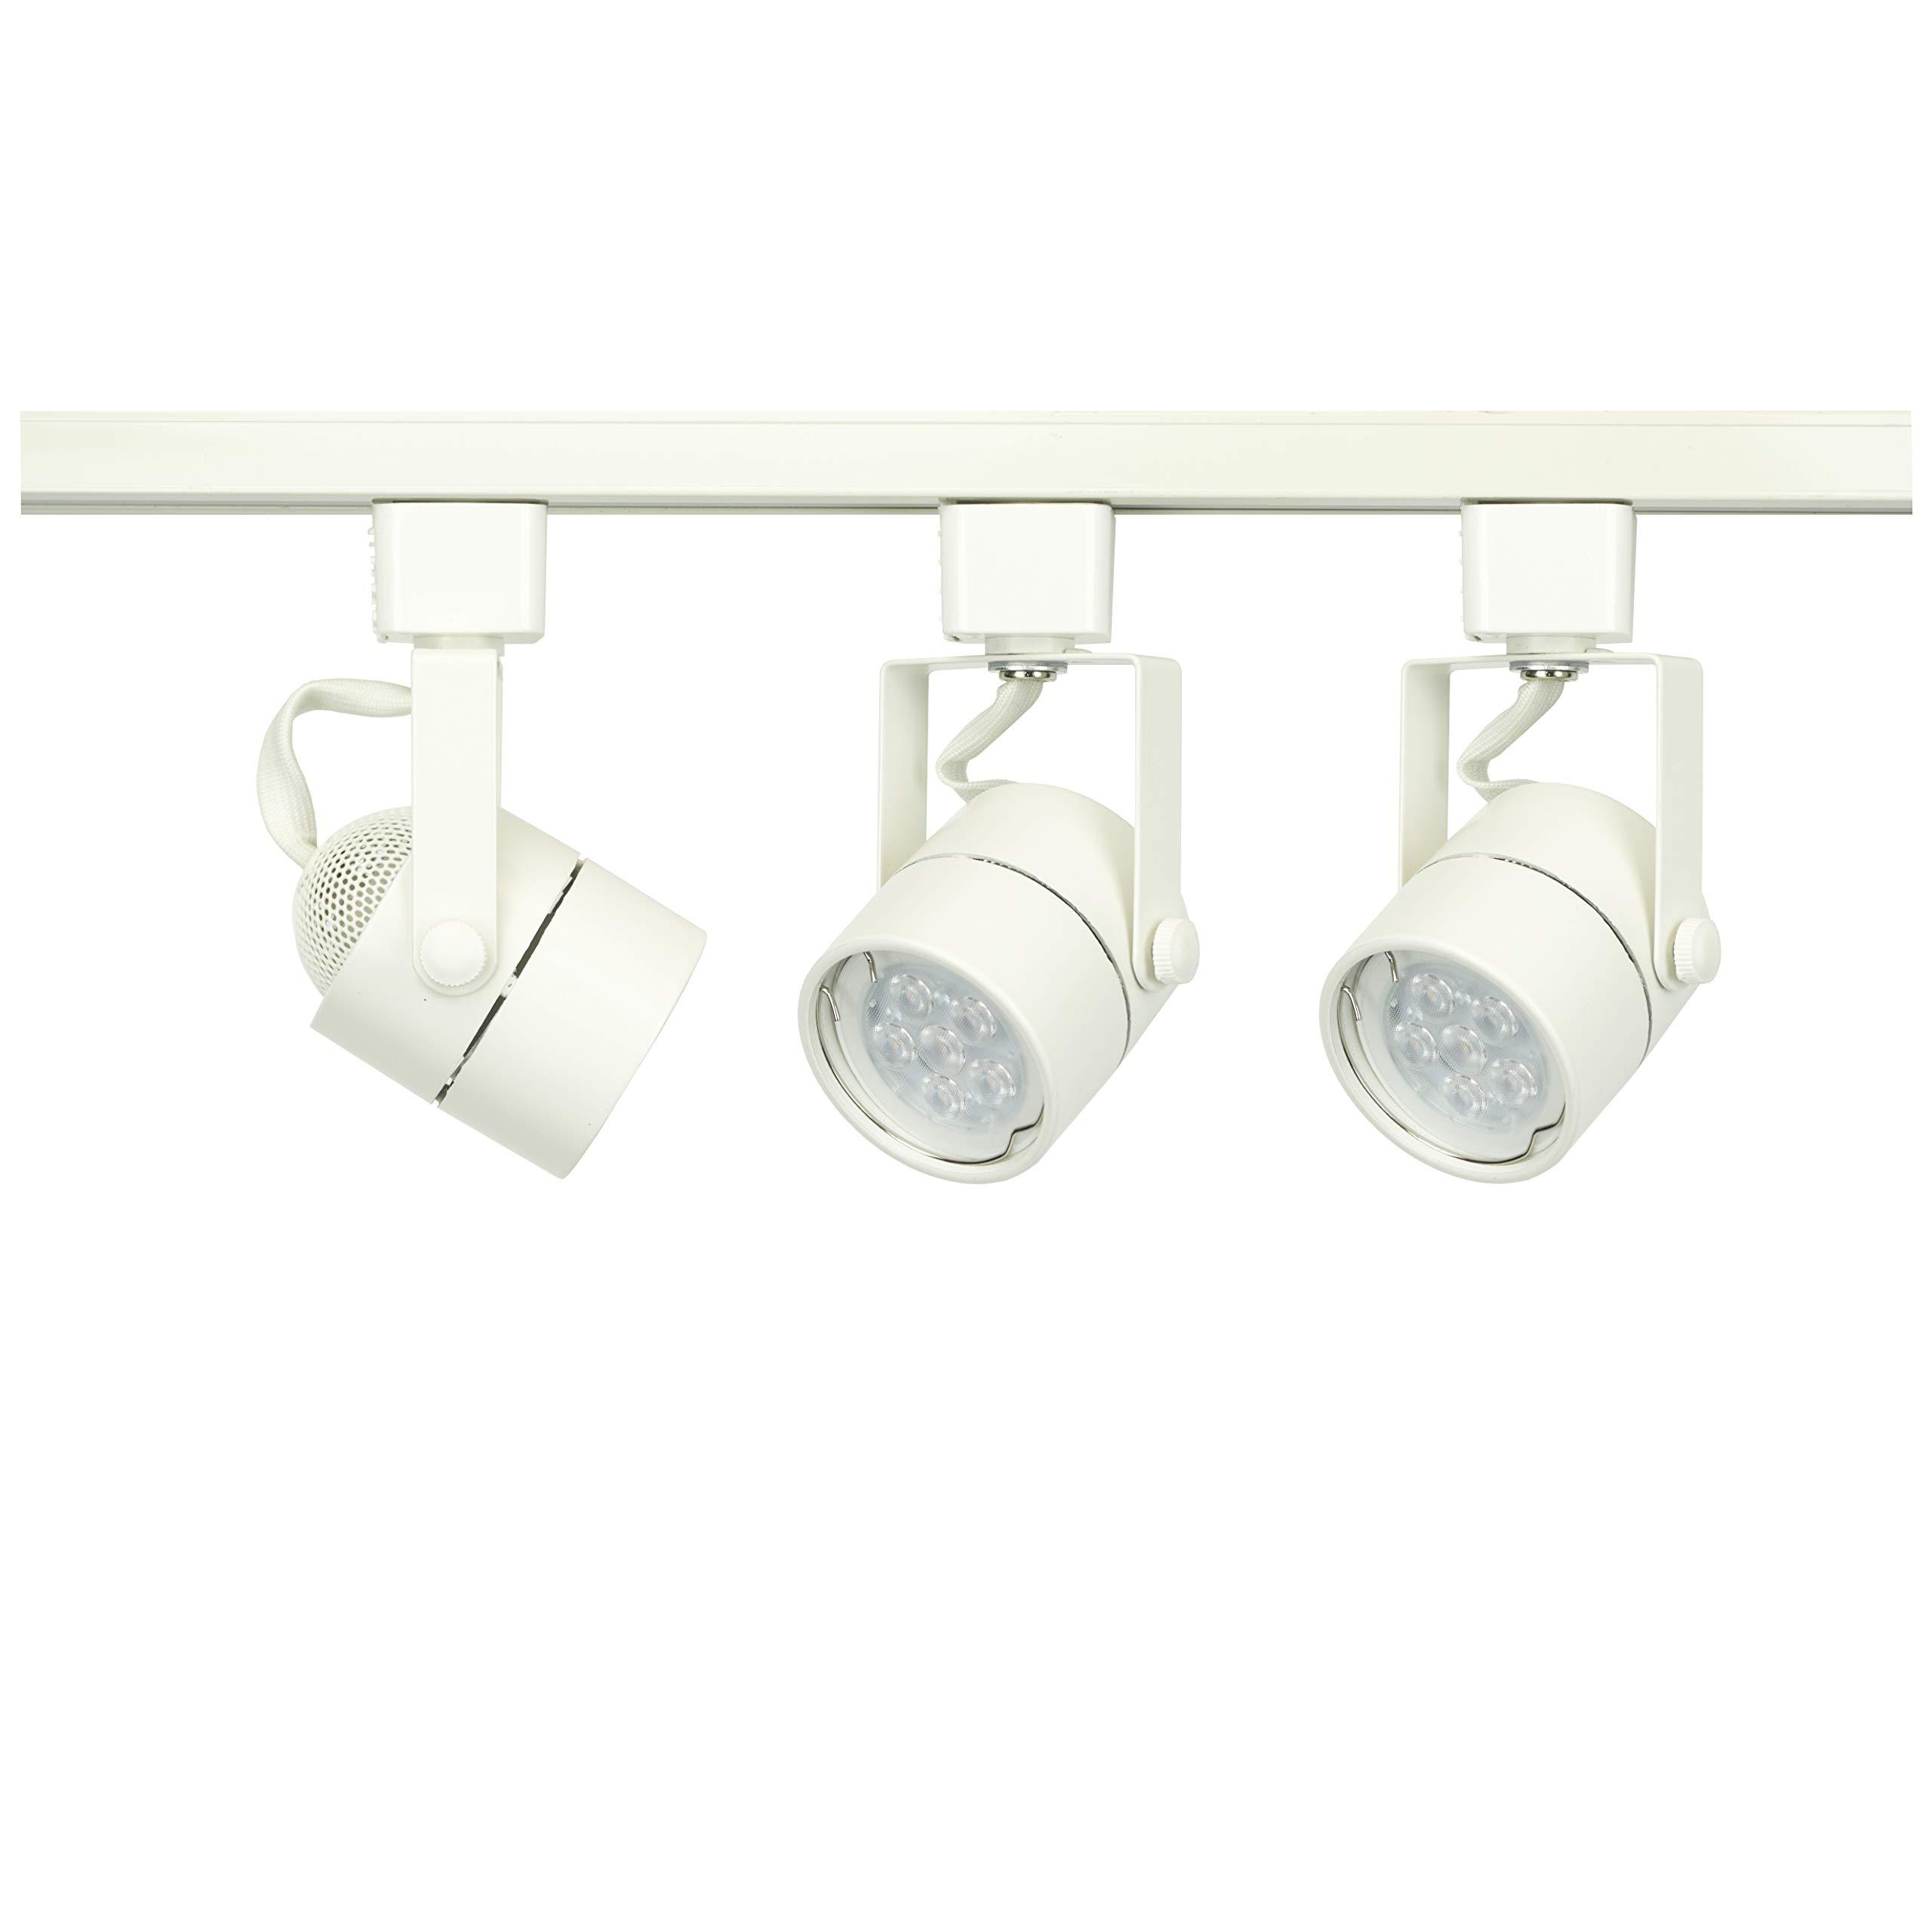 D&D Brand H System 3-Lights GU10 7.5W LED Track Lighting Kit White 3K (500 lumens) Warm White HTC-9154-330K-WH Bulbs Included